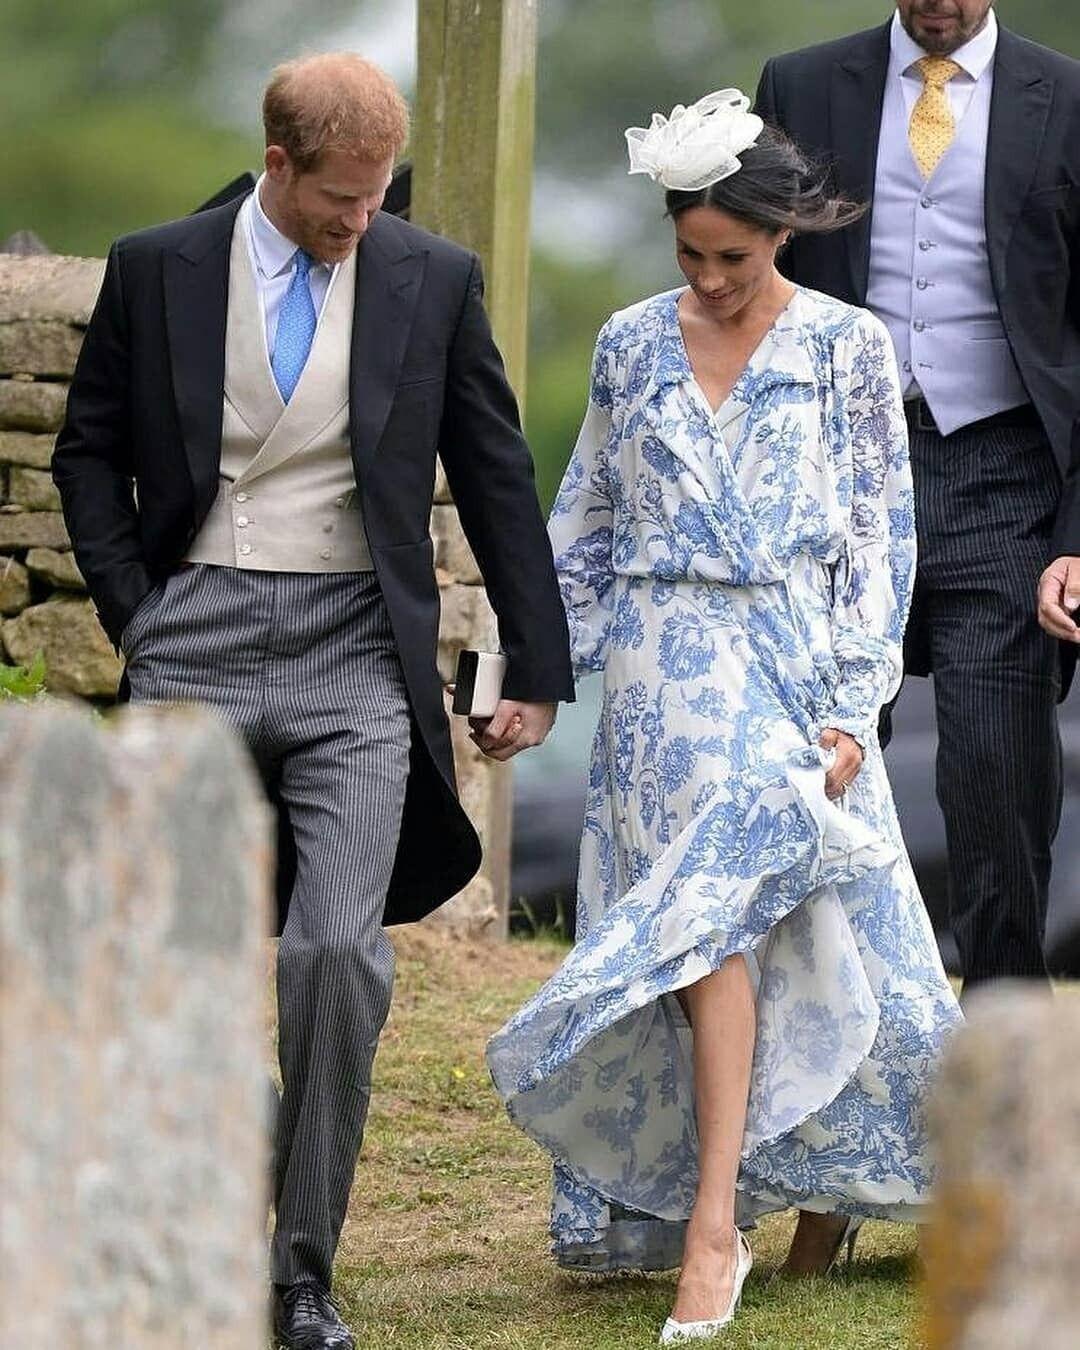 Harry And Meghan Attend His Cousin Celia Mccorquodale S Wedding Meghan Markle Hippie Look Meghan Markle Stil